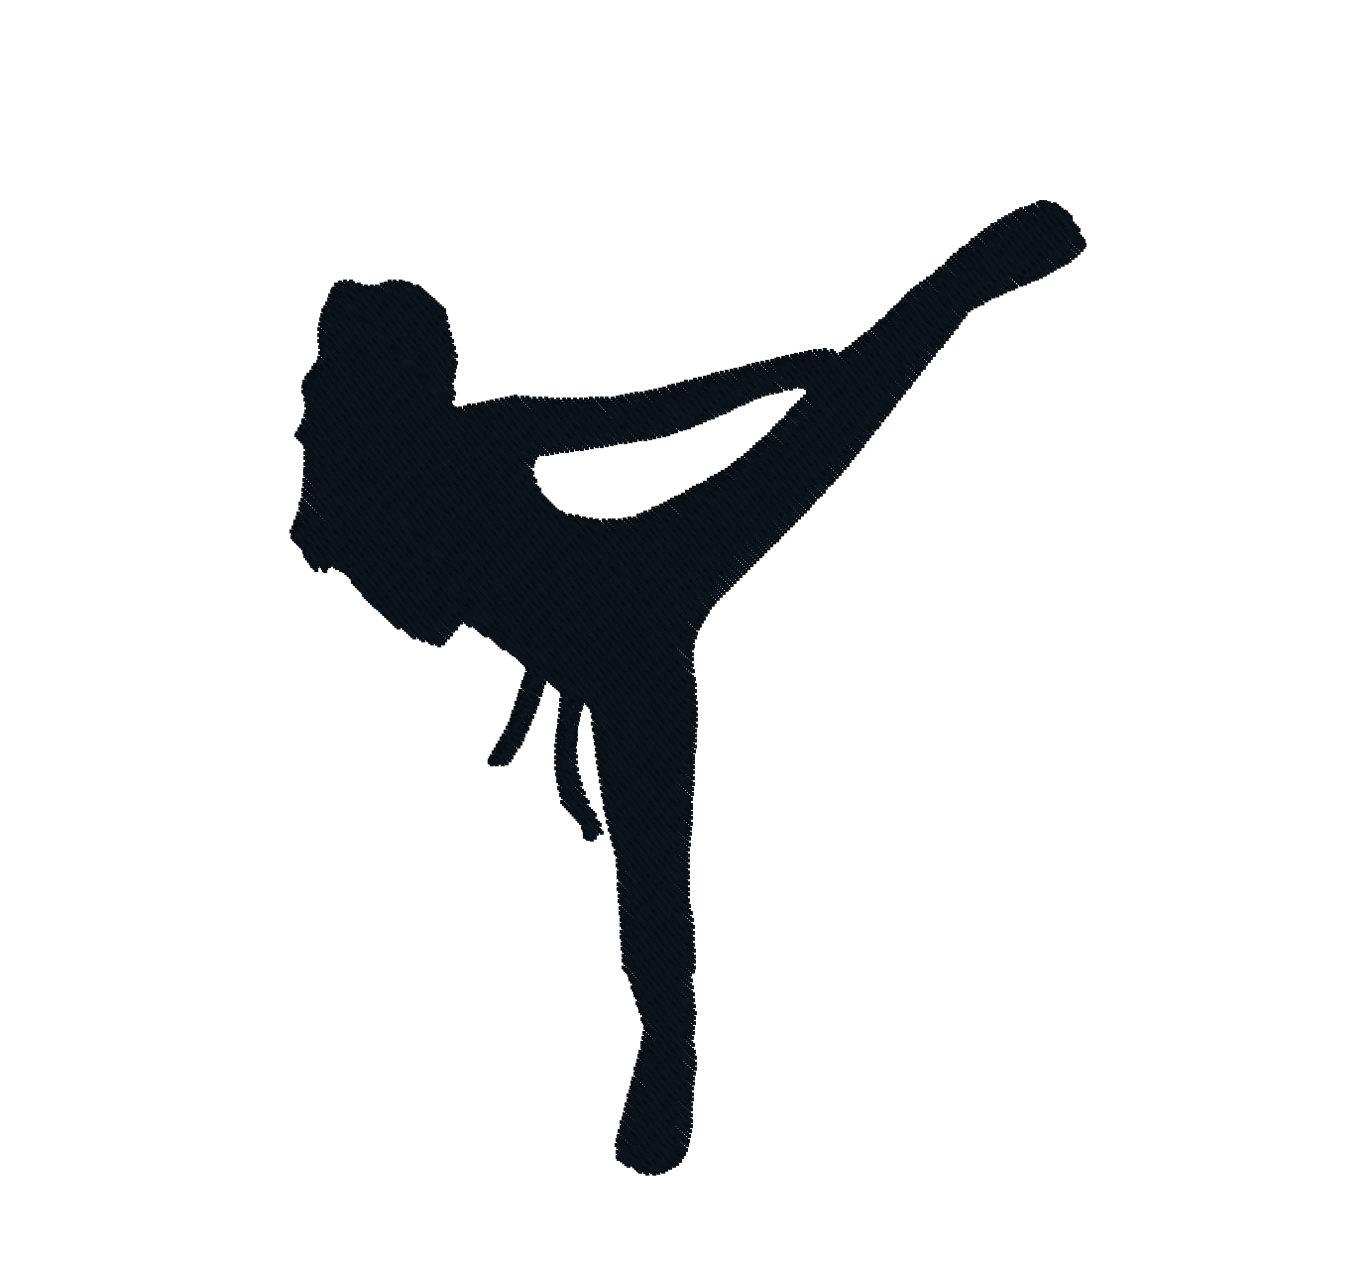 1368x1284 Buy 2 Get 1 Free Girl Martial Arts Karate Kick Boxing